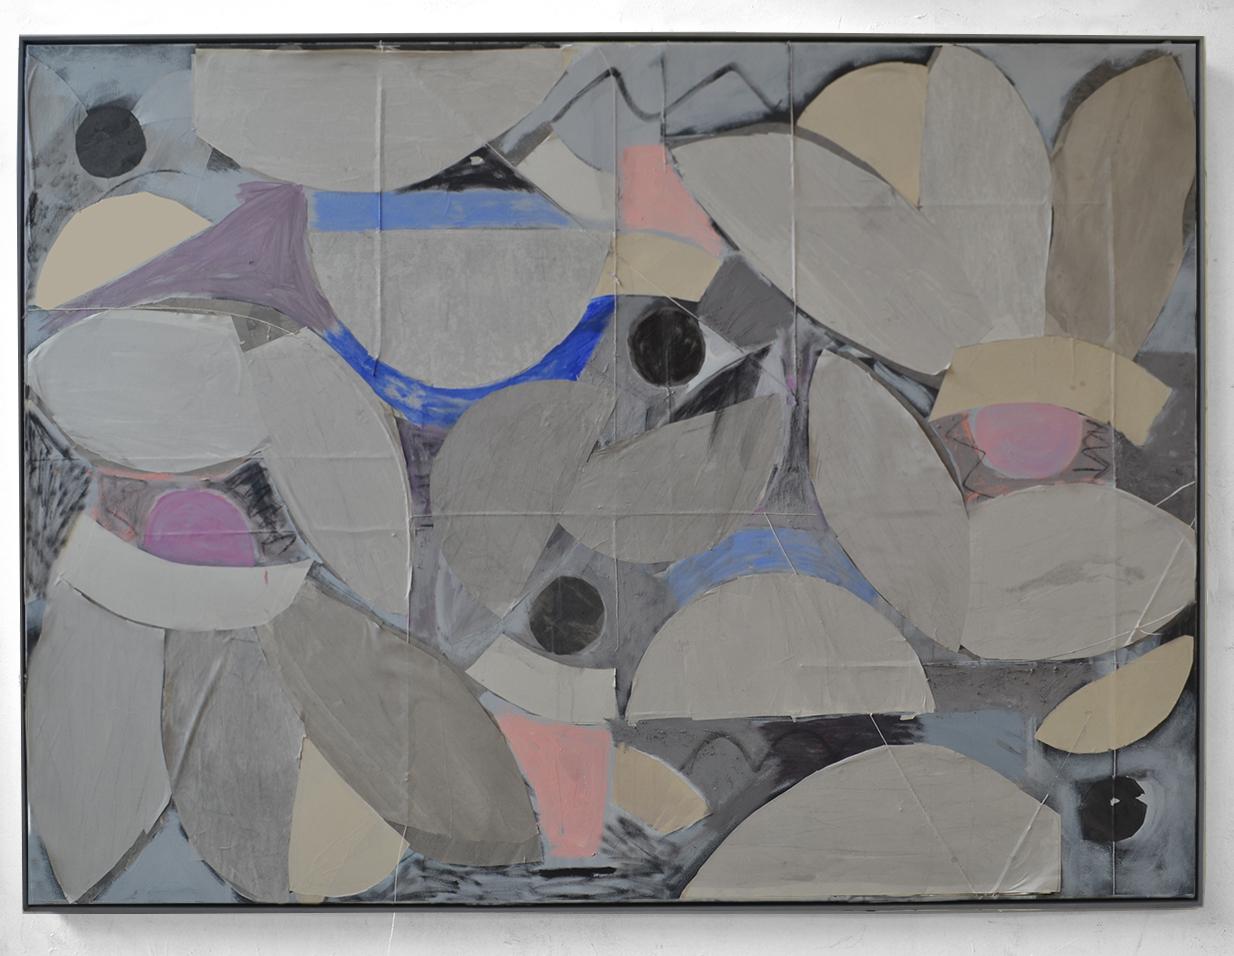 Mirror image, 150 x 205 cm